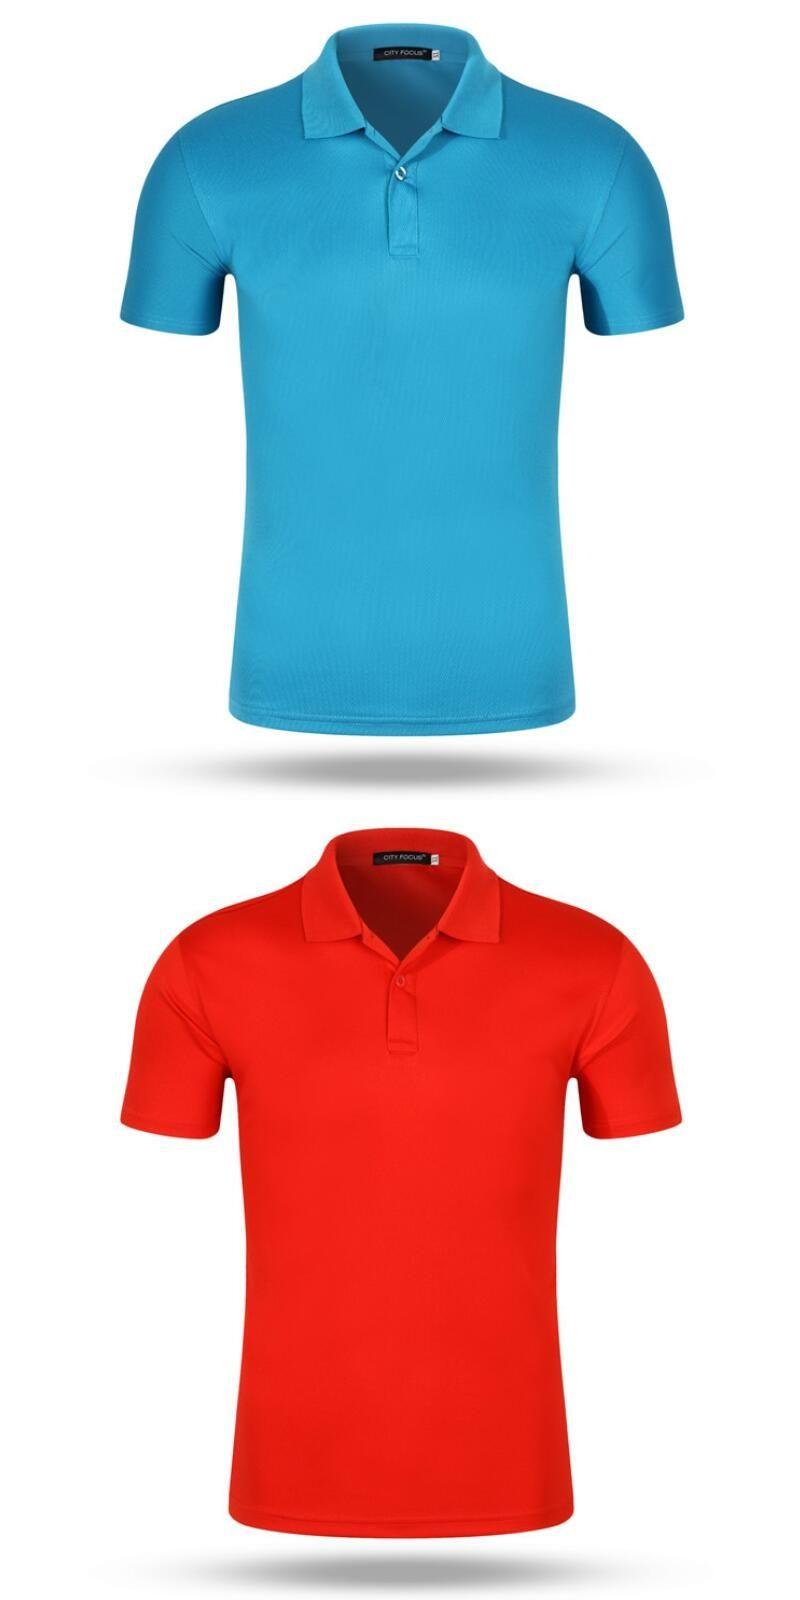 New 2017 Men s Brand Polo Shirt For Men Designer Polos Men Cotton Short  Sleeve shirt Brands jerseys golftennis Free Shippin c879ae682